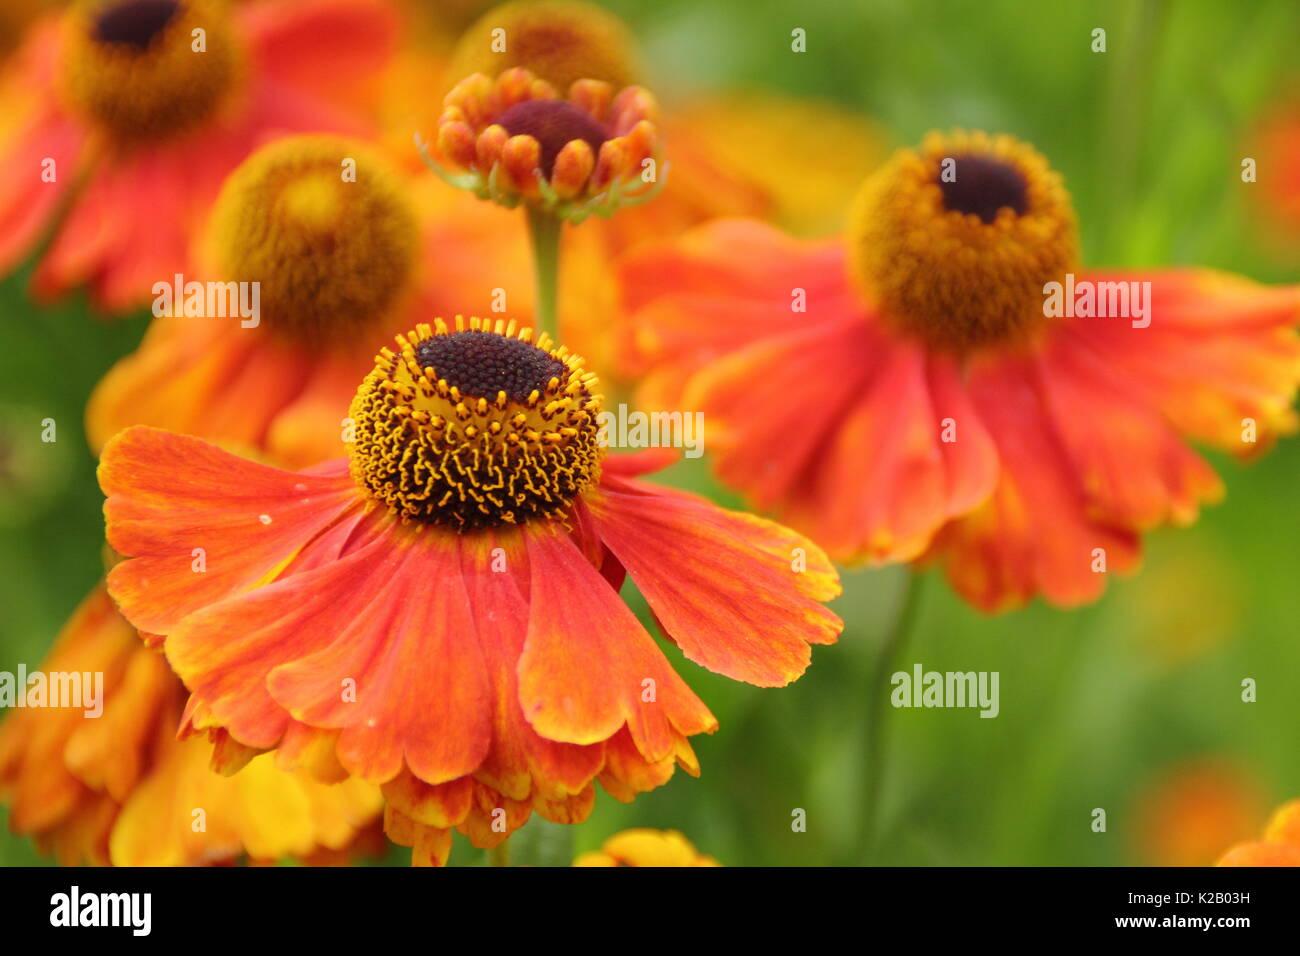 The Bronze And Orange Daisy Like Flowers Of Helenium Waltraut Or